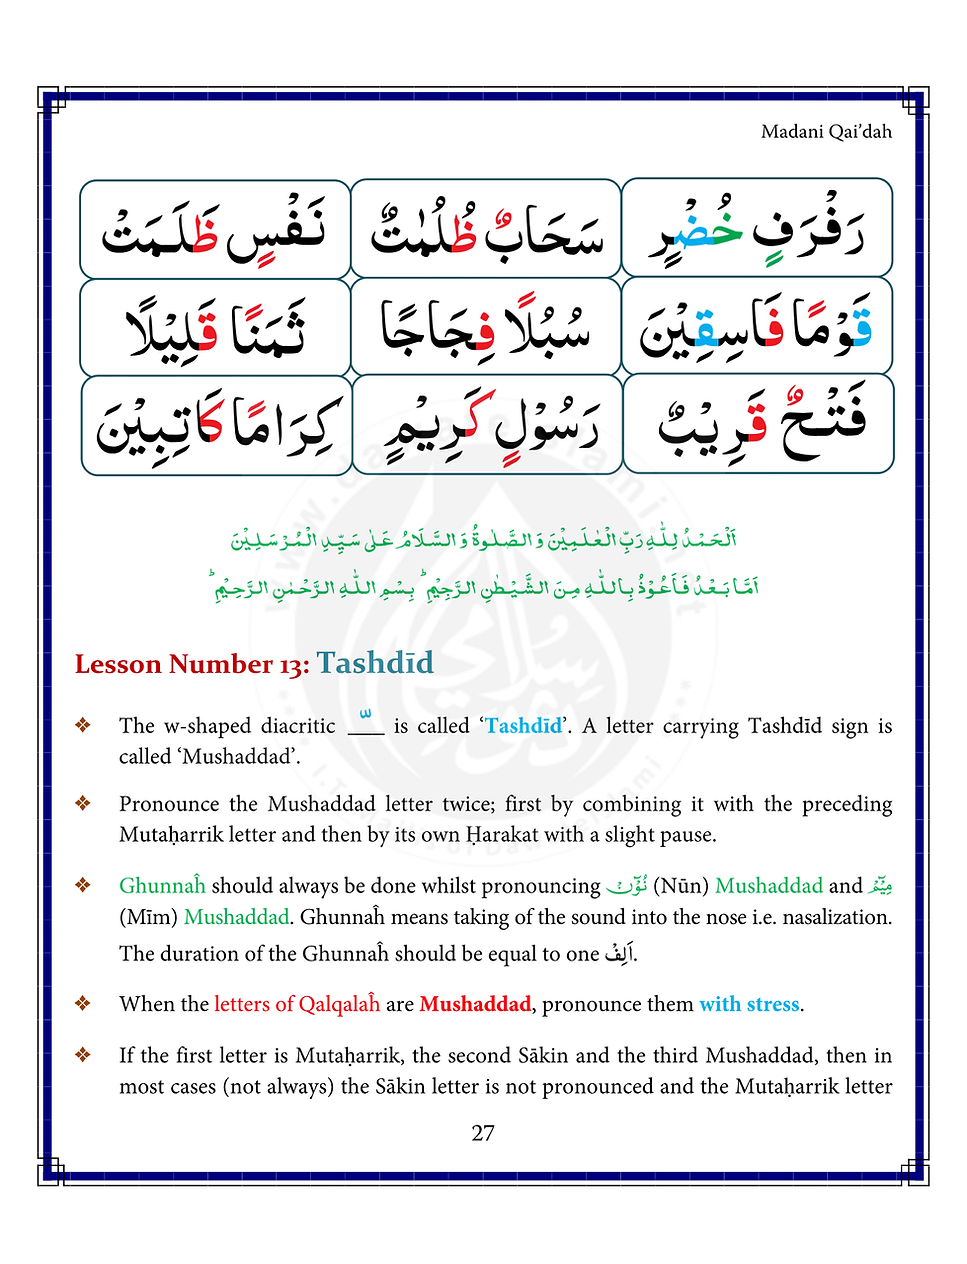 Madani Qaidah-37.png